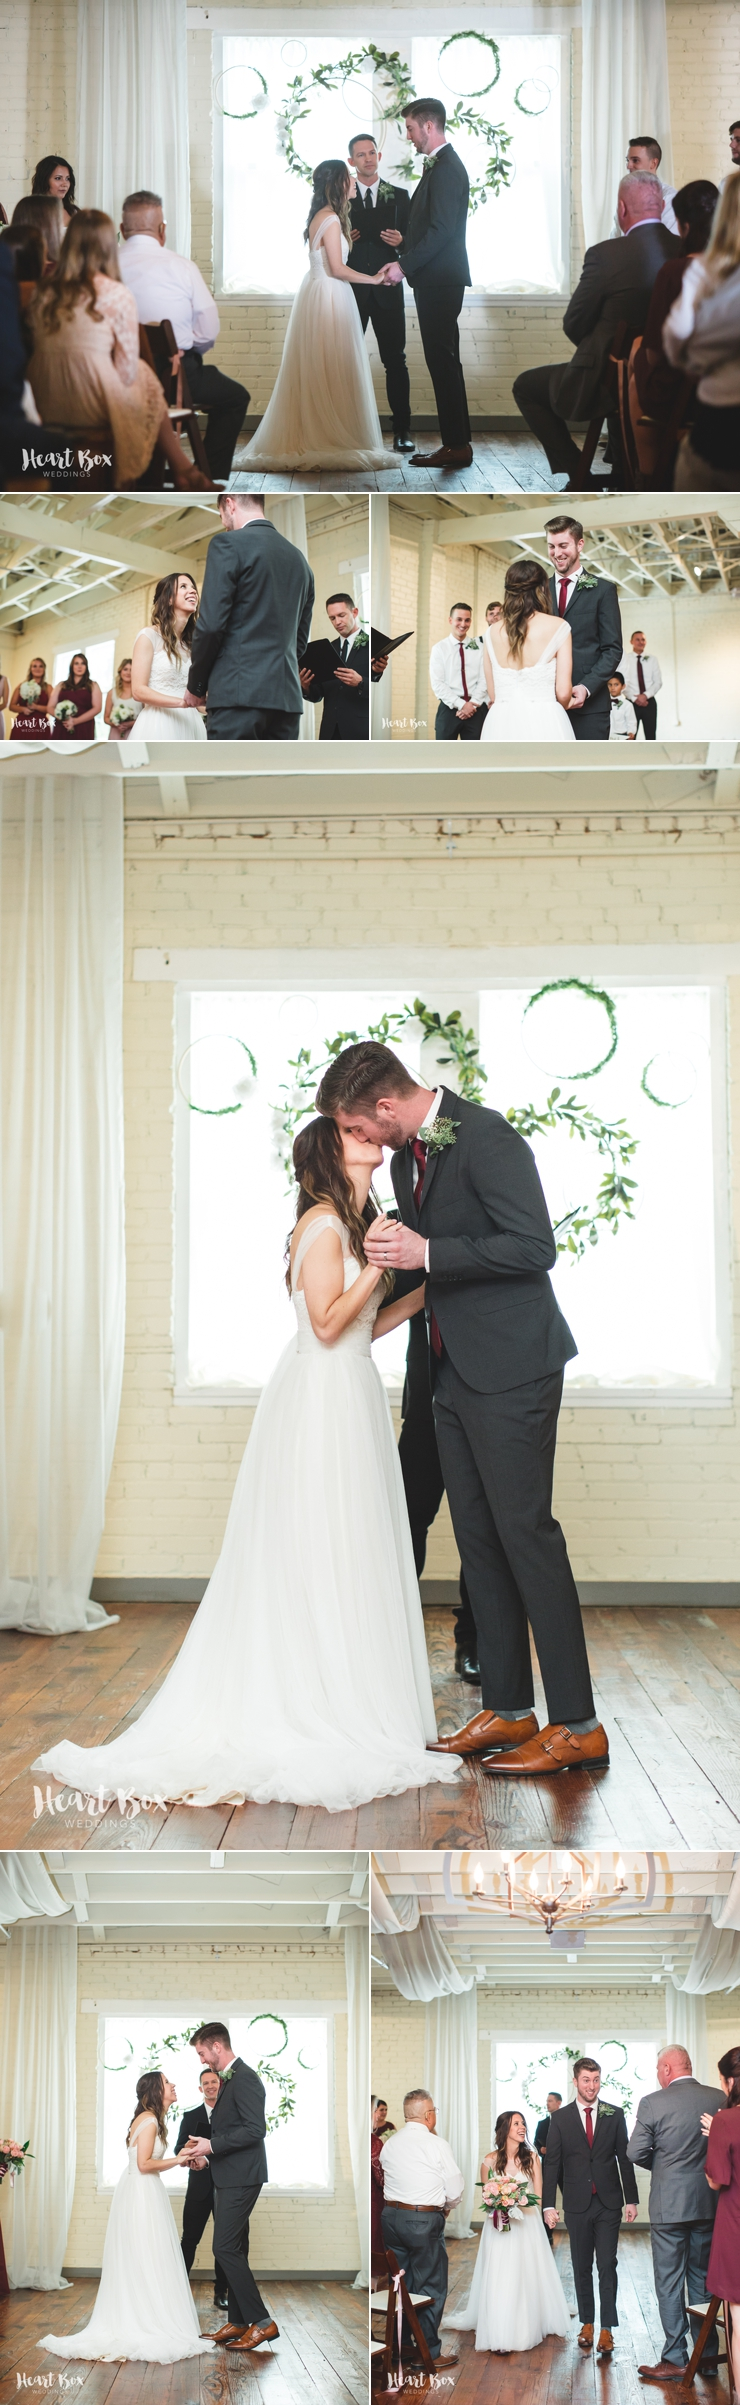 Hicks Wedding 17.jpg